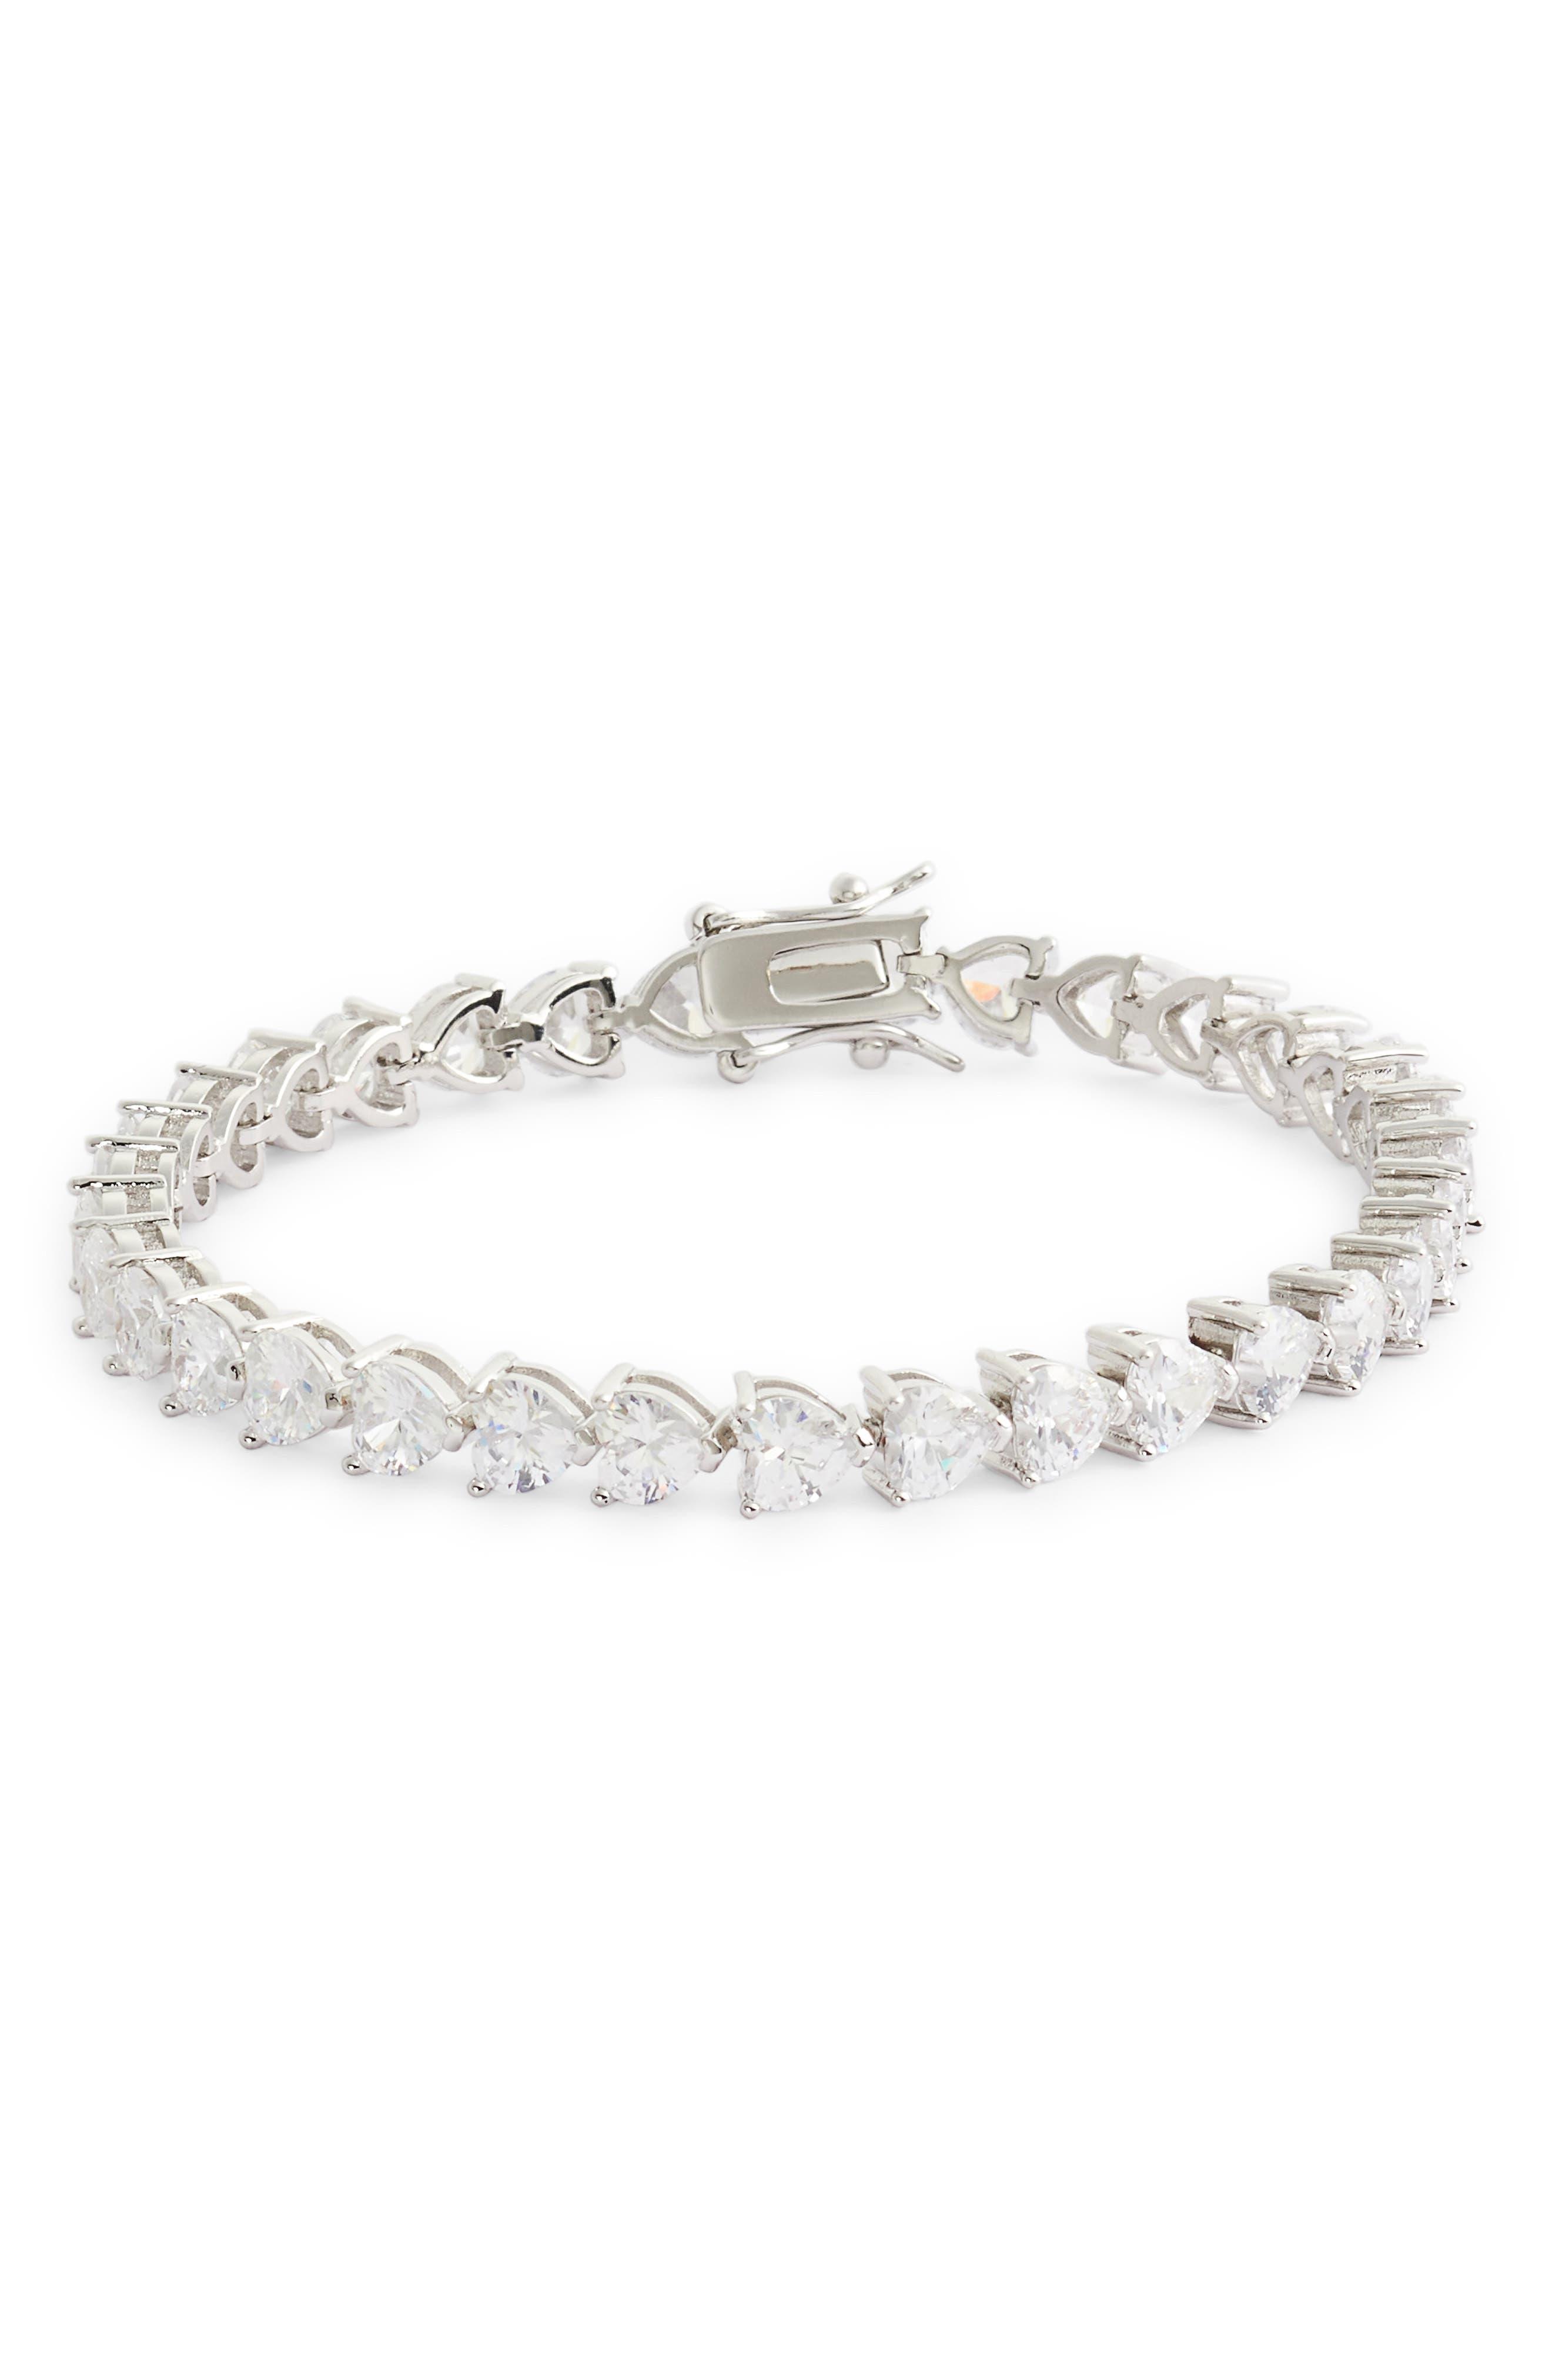 NINA, Heart Shaped Cubic Zirconia Link Bracelet, Main thumbnail 1, color, WHITE/ SILVER